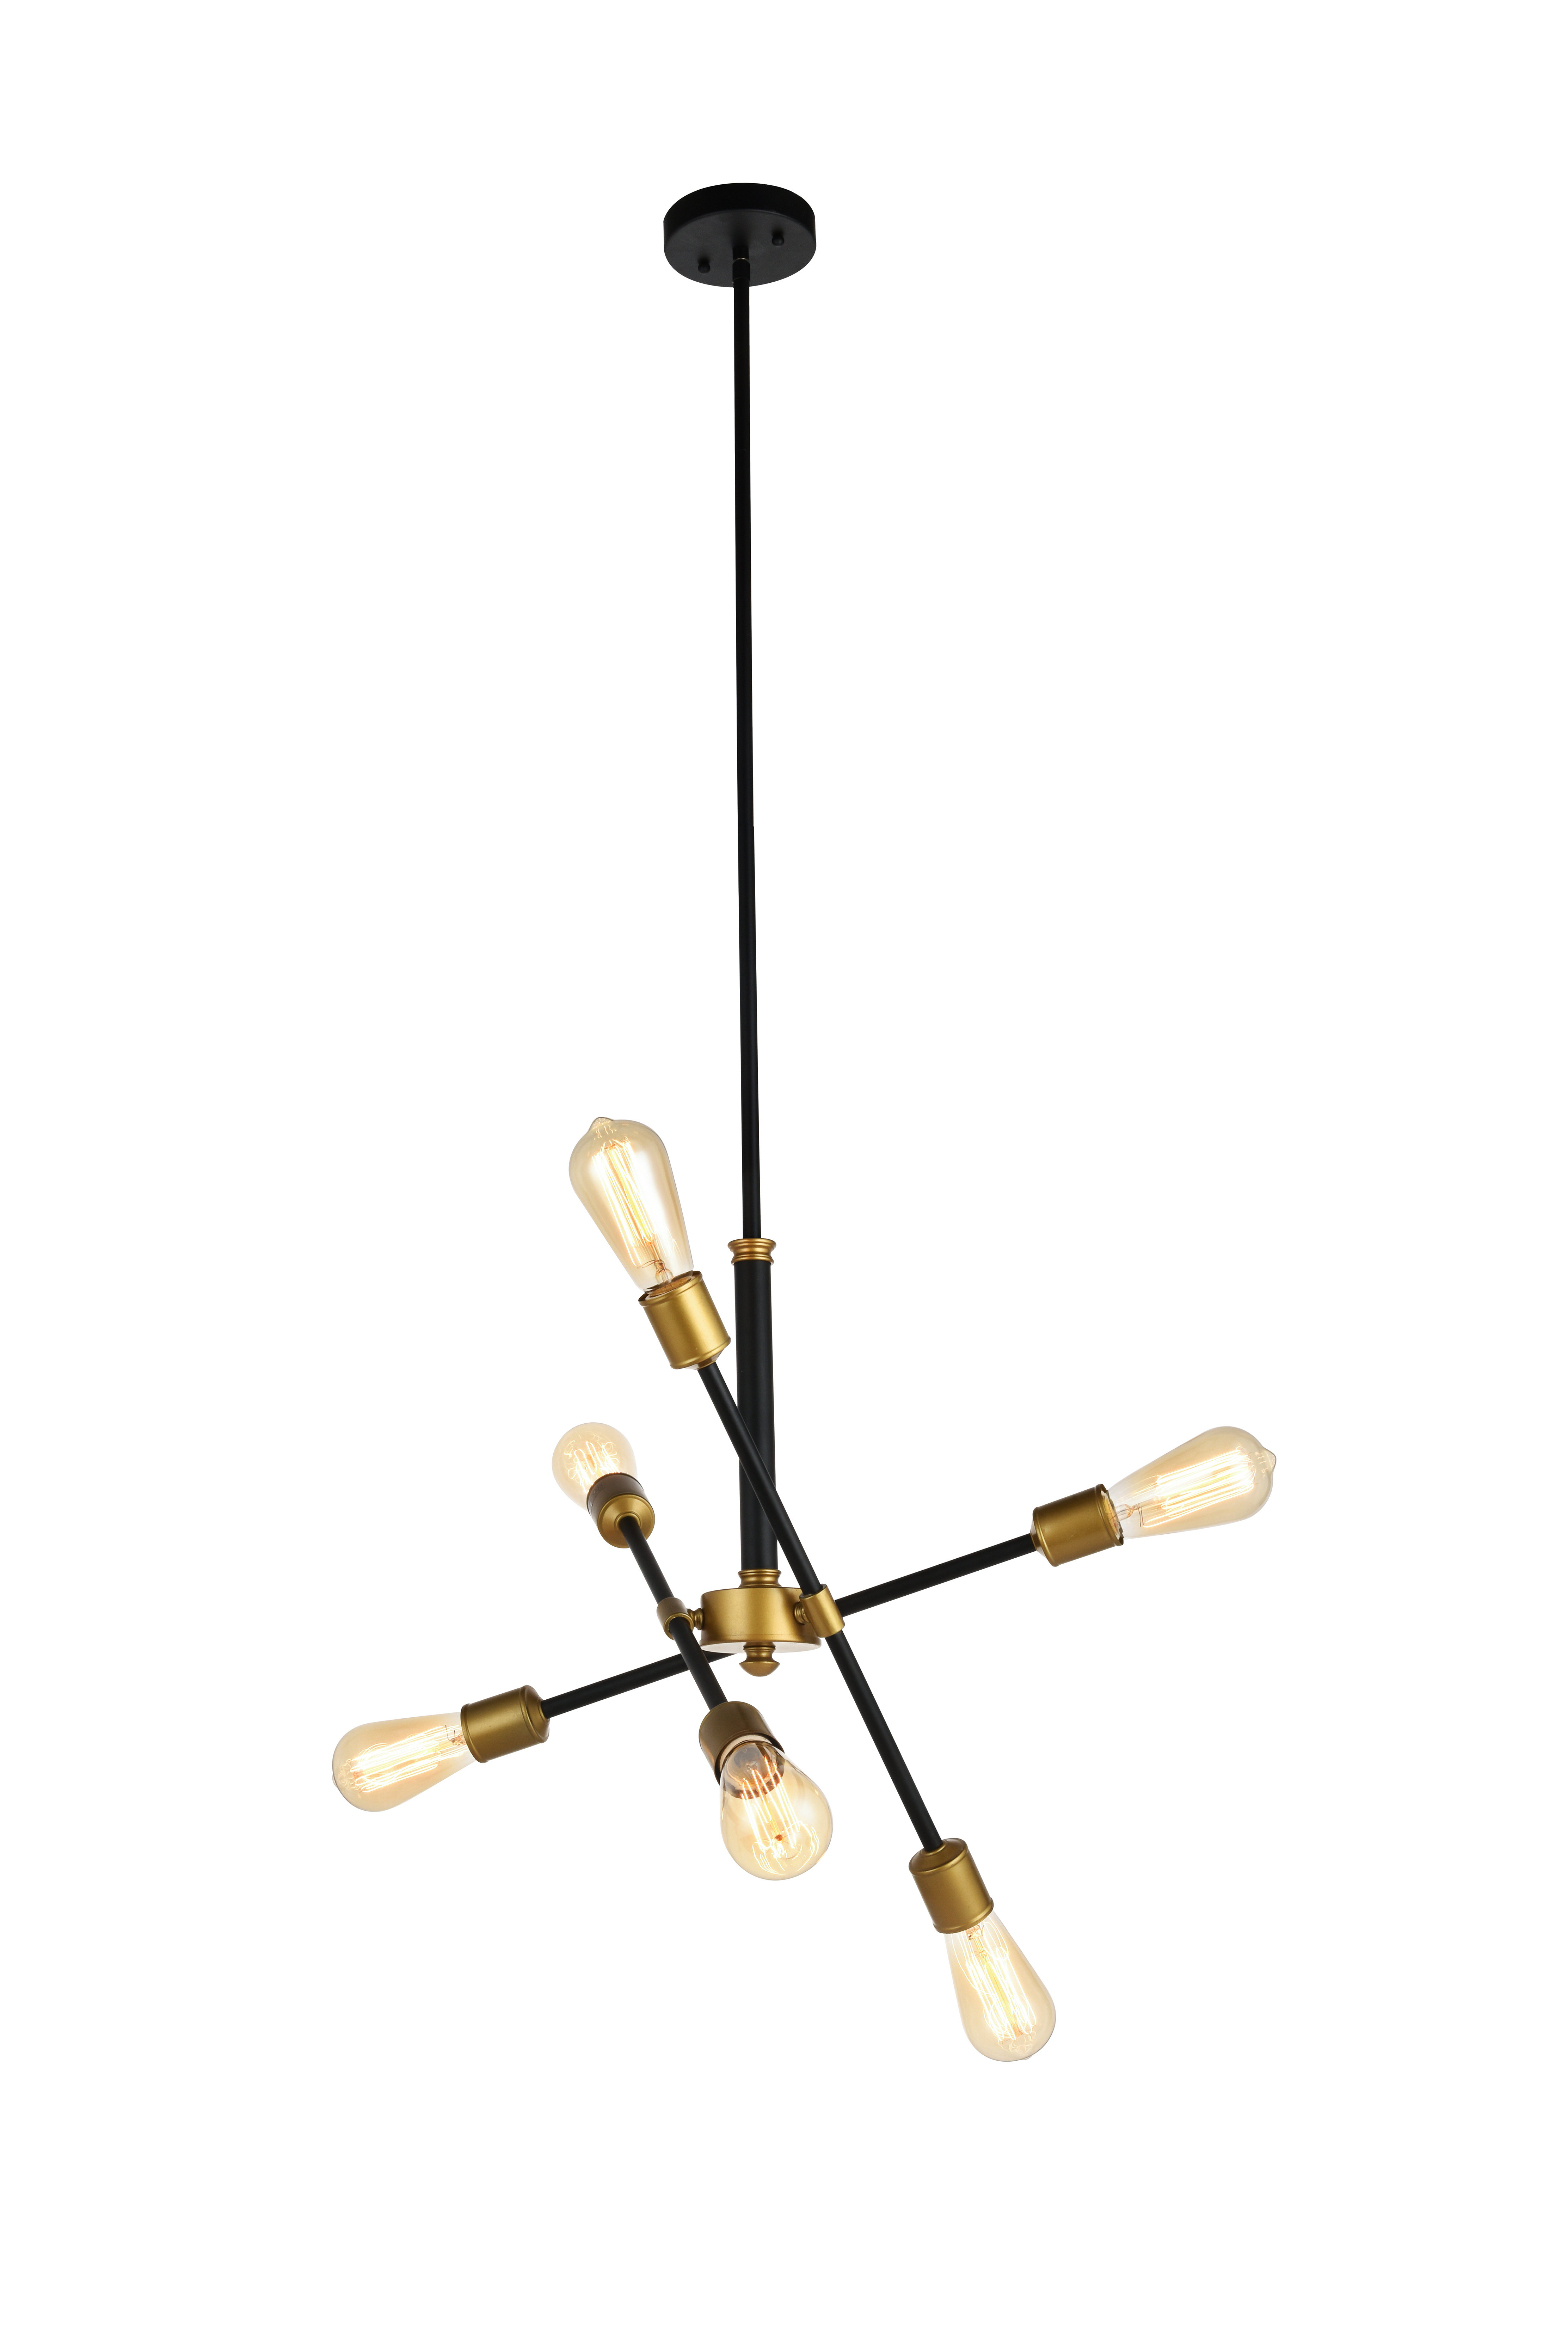 Eladia 6-Light Sputnik Chandeliers in Most Up-to-Date Mullet 6-Light Sputnik Chandelier